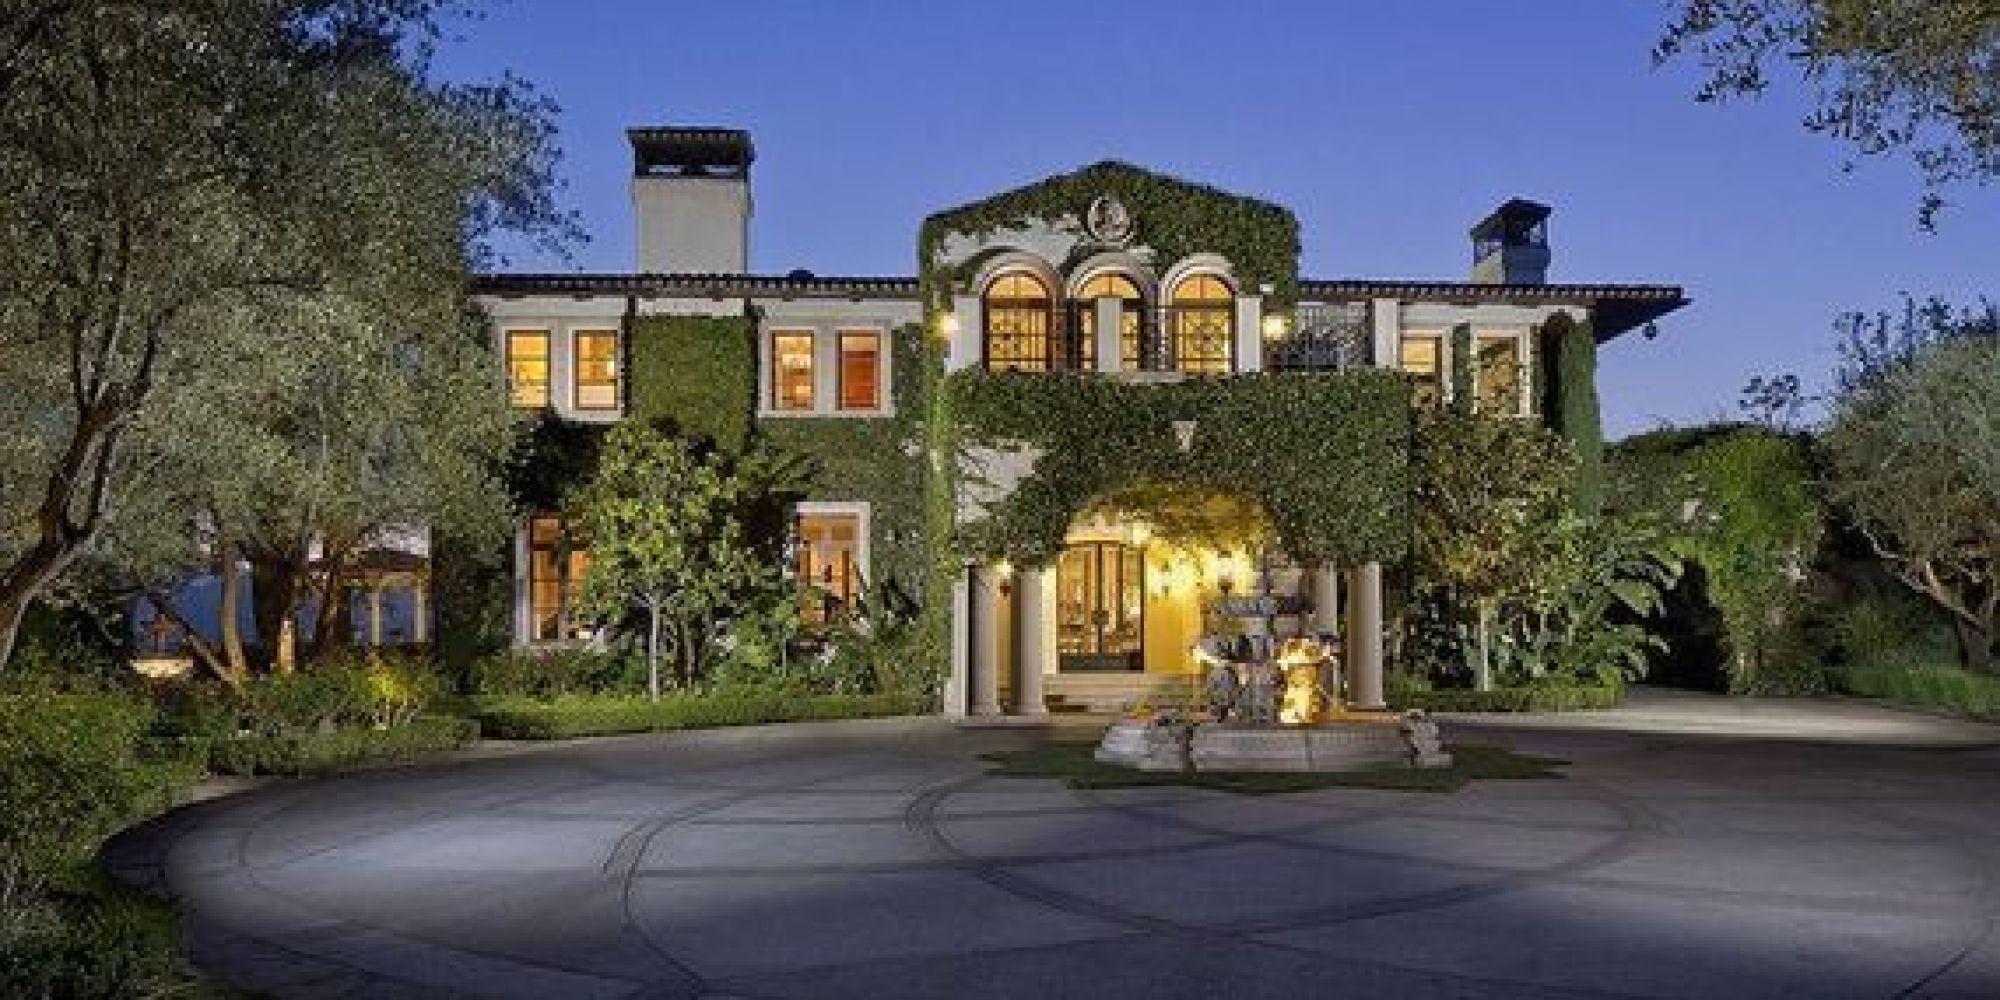 Pics of celebrity homes - Pics Of Celebrity Homes 13